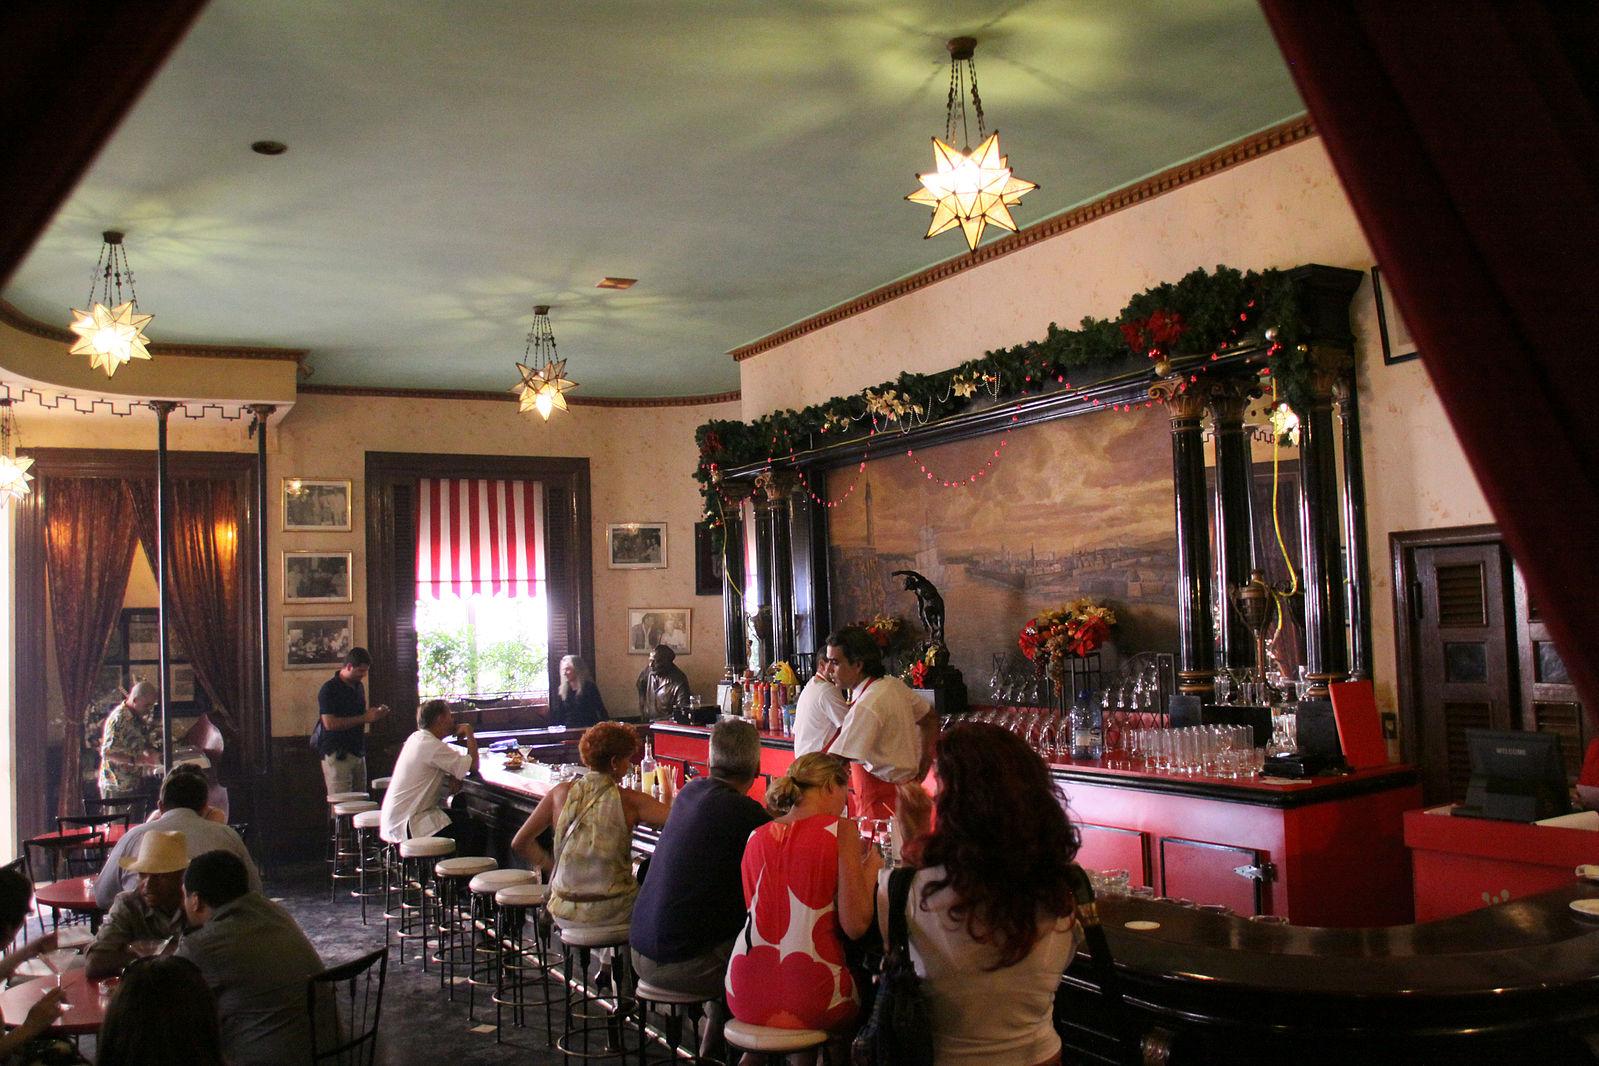 La Floridita restaurant in Cuba